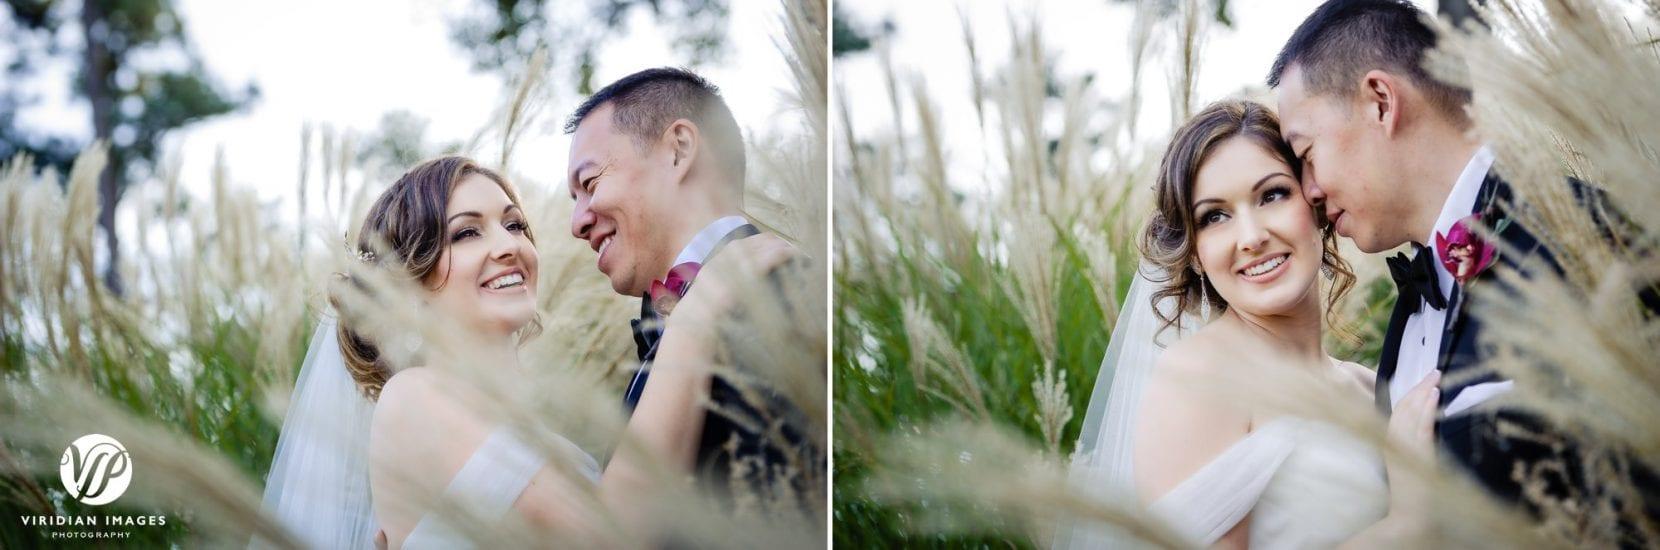 wedding portraits tall grass